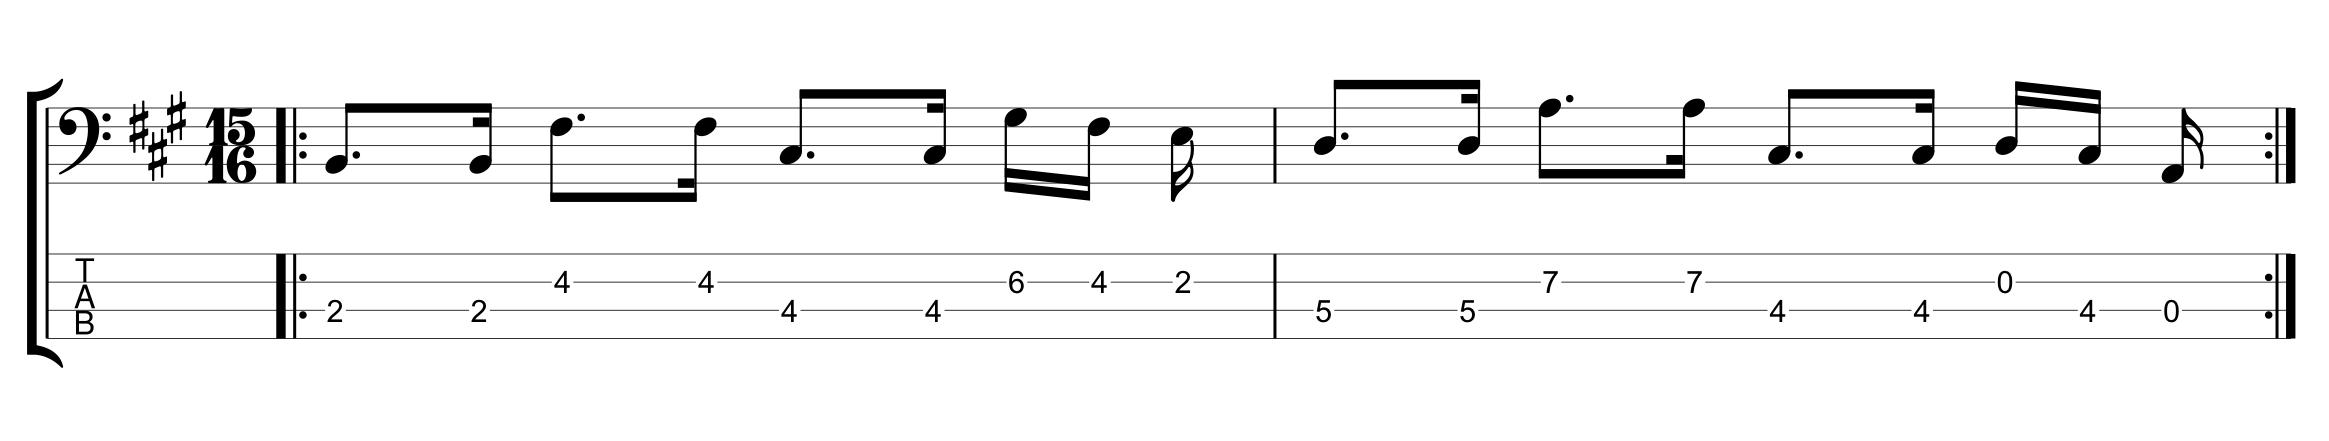 Odd Meter Bassline in 15/16